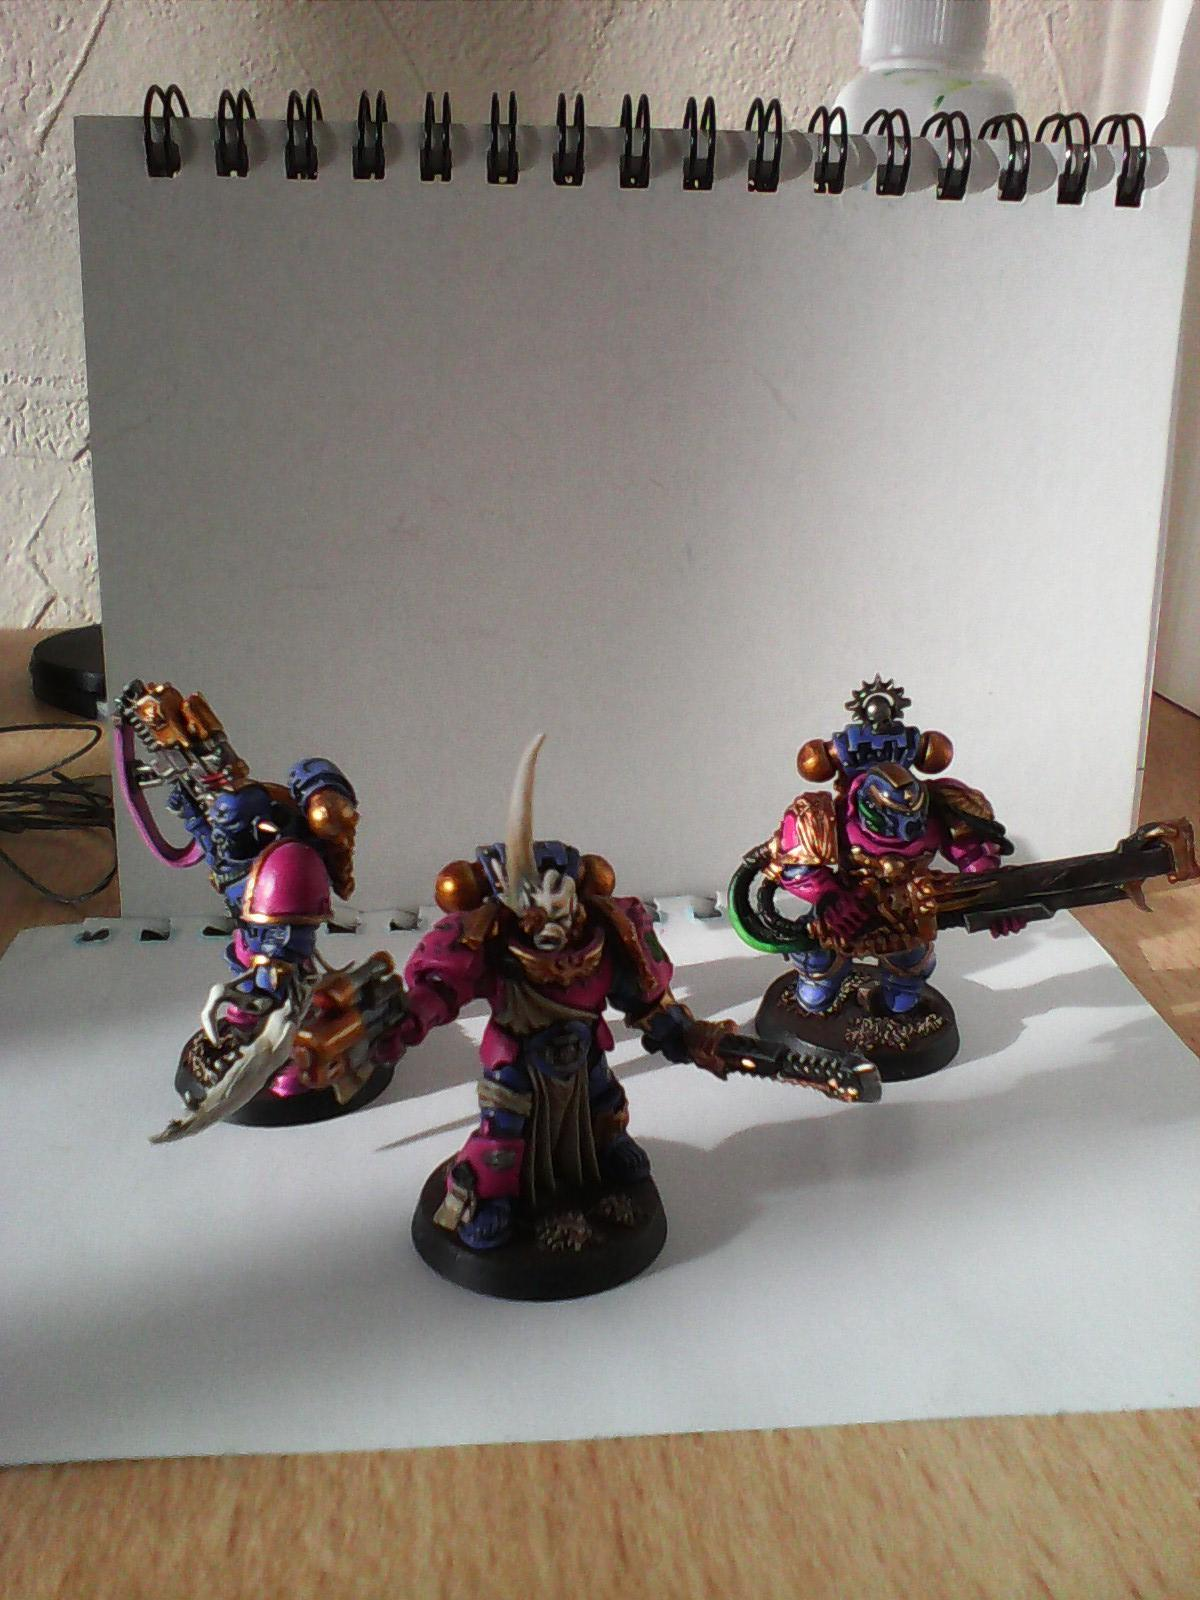 Blastmaster, Champion, Chaos Space Marines, Slaanesh